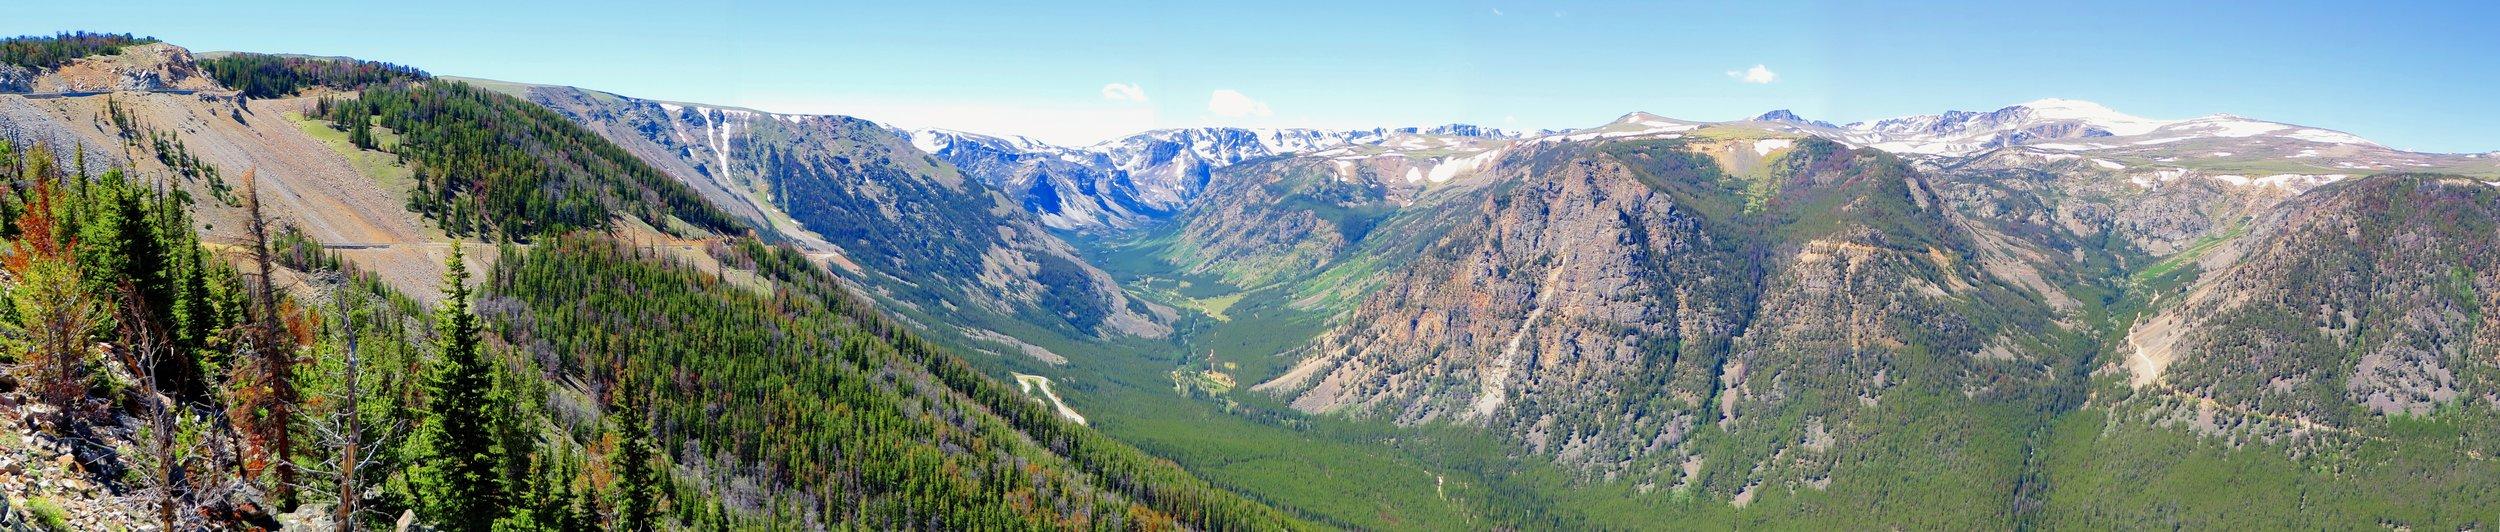 Rock-River-Valley-panorama.jpg